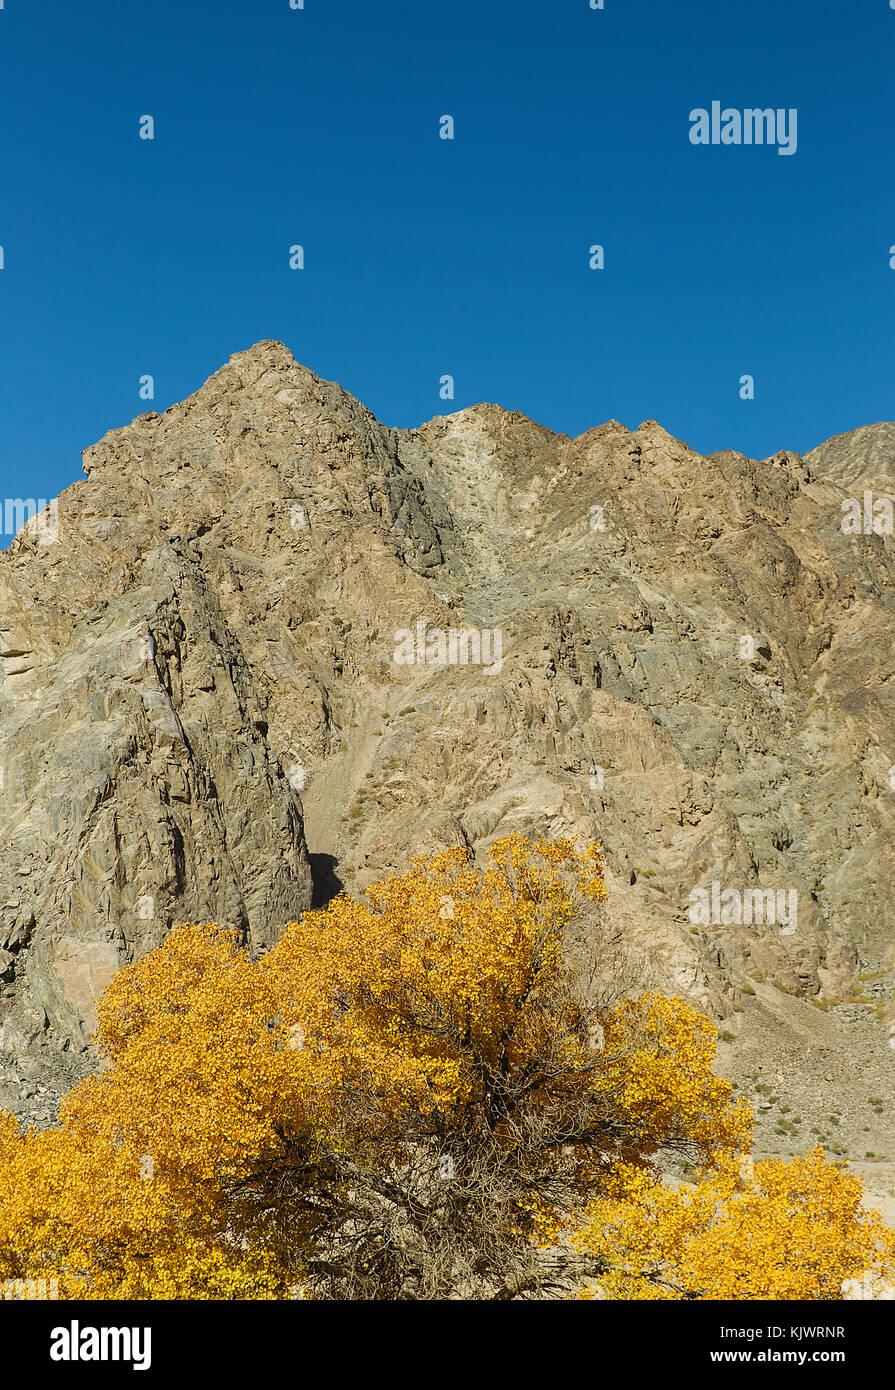 Yulin River Valley, Gansu Province-China - Stock Image